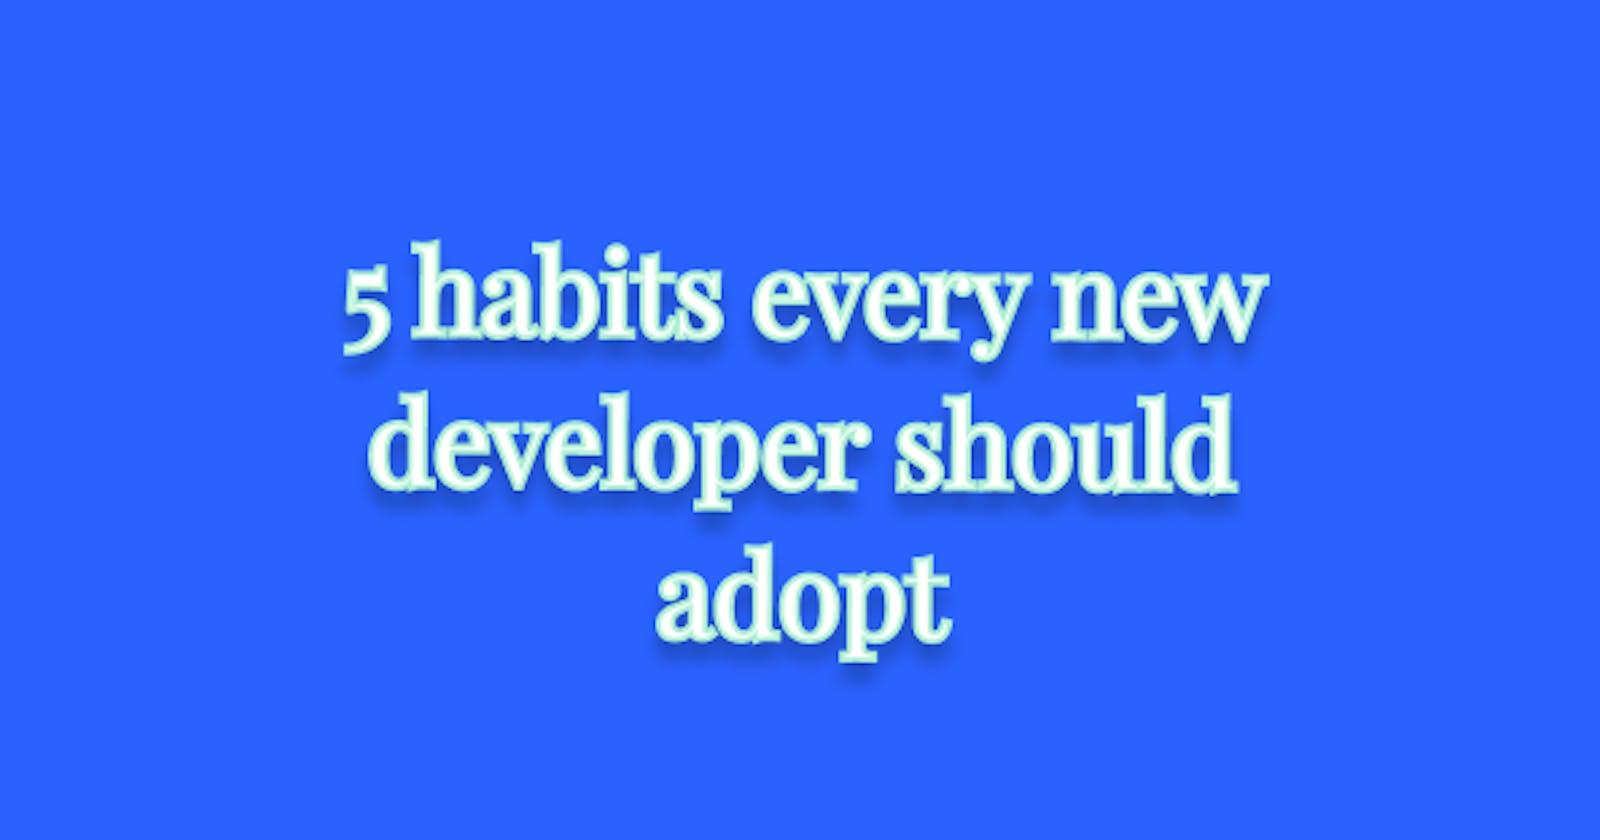 5 habits every developer should adopt!